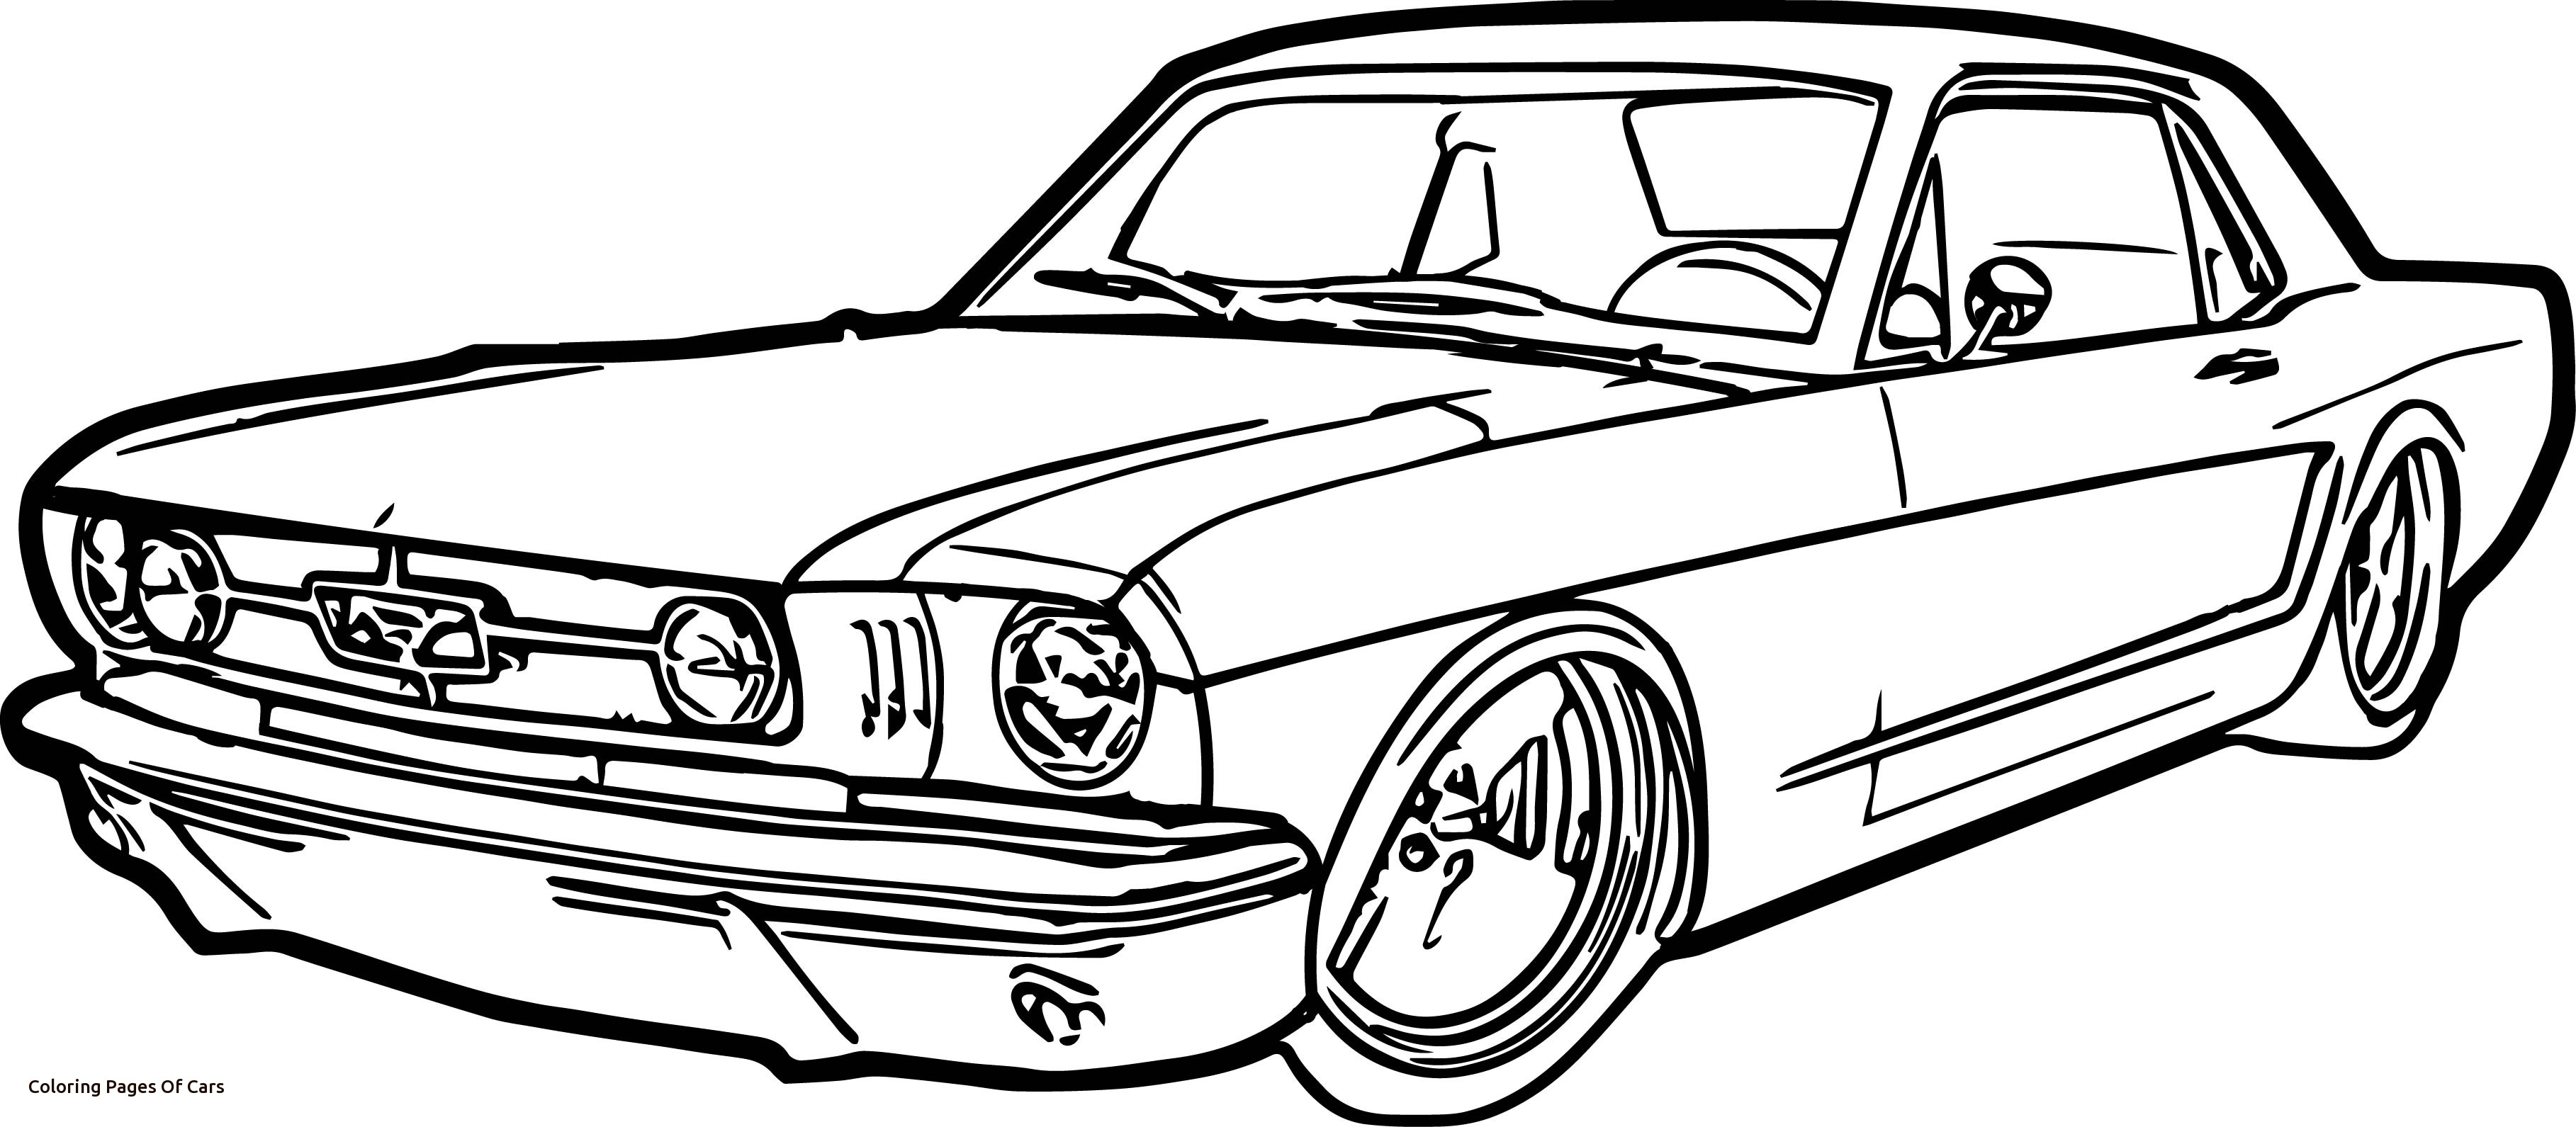 Fox Body Mustang Drawing At Getdrawings